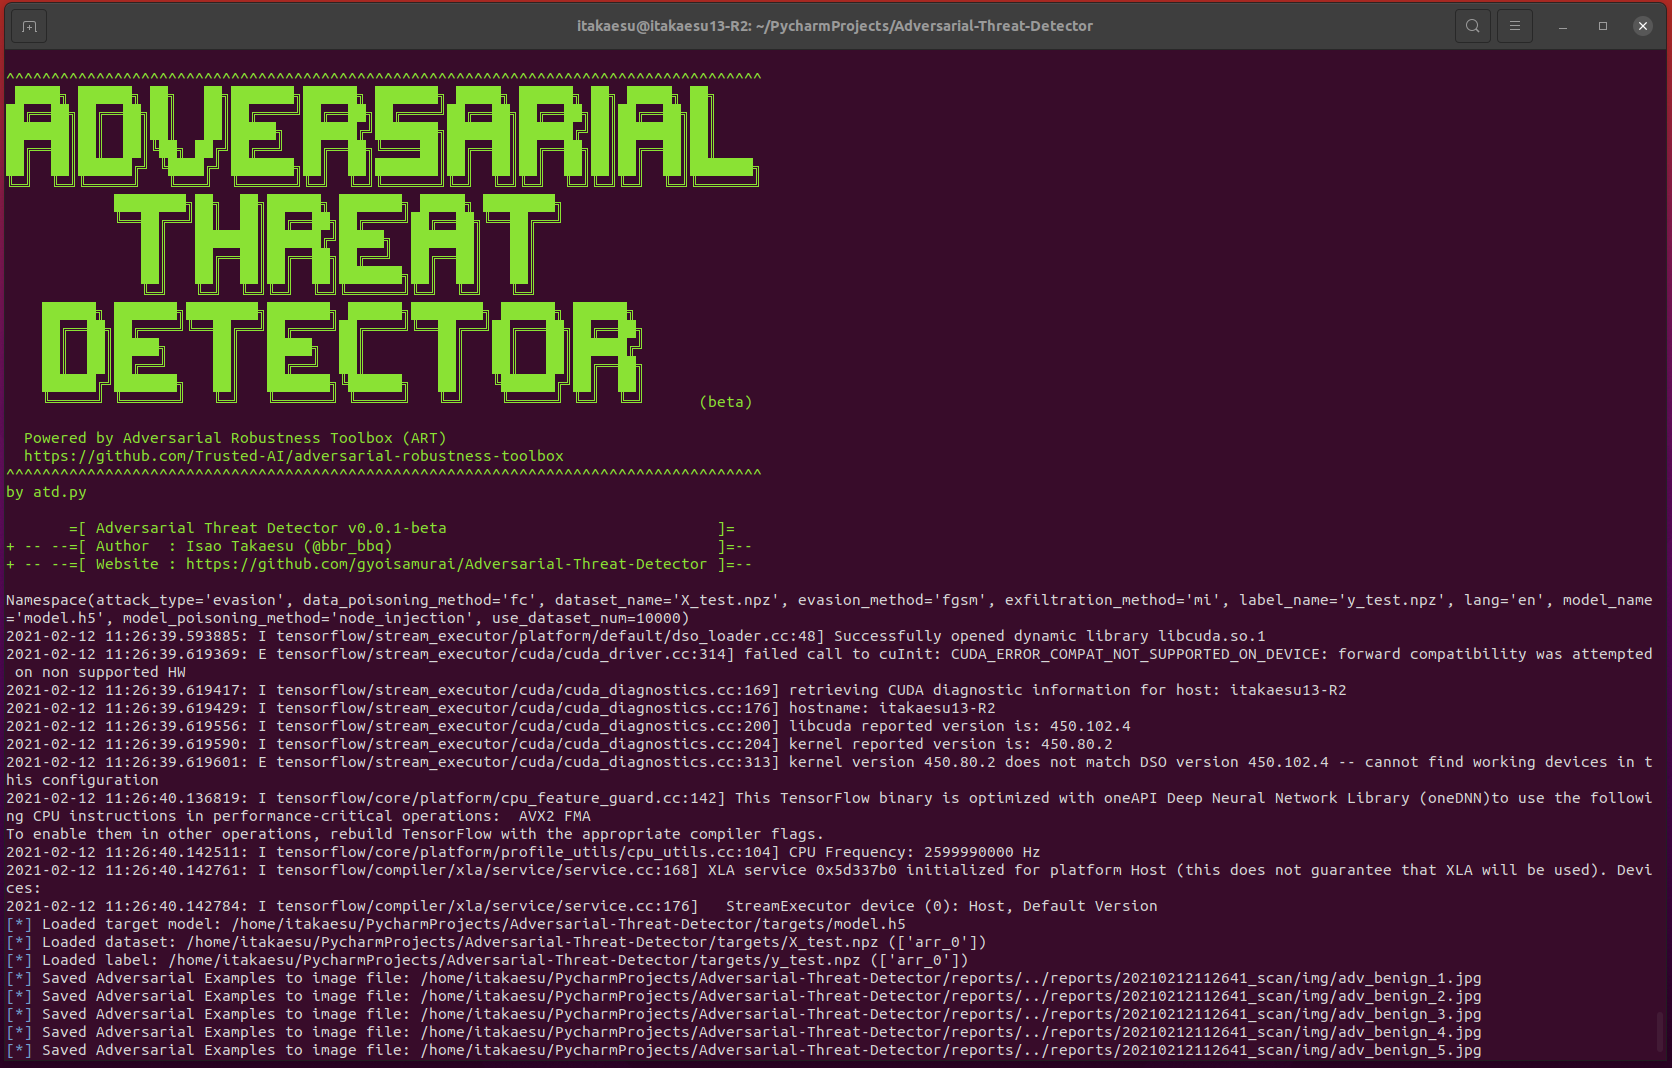 Adversarial Threat Detector: detects vulnerabilities in deep learning-based classifiers